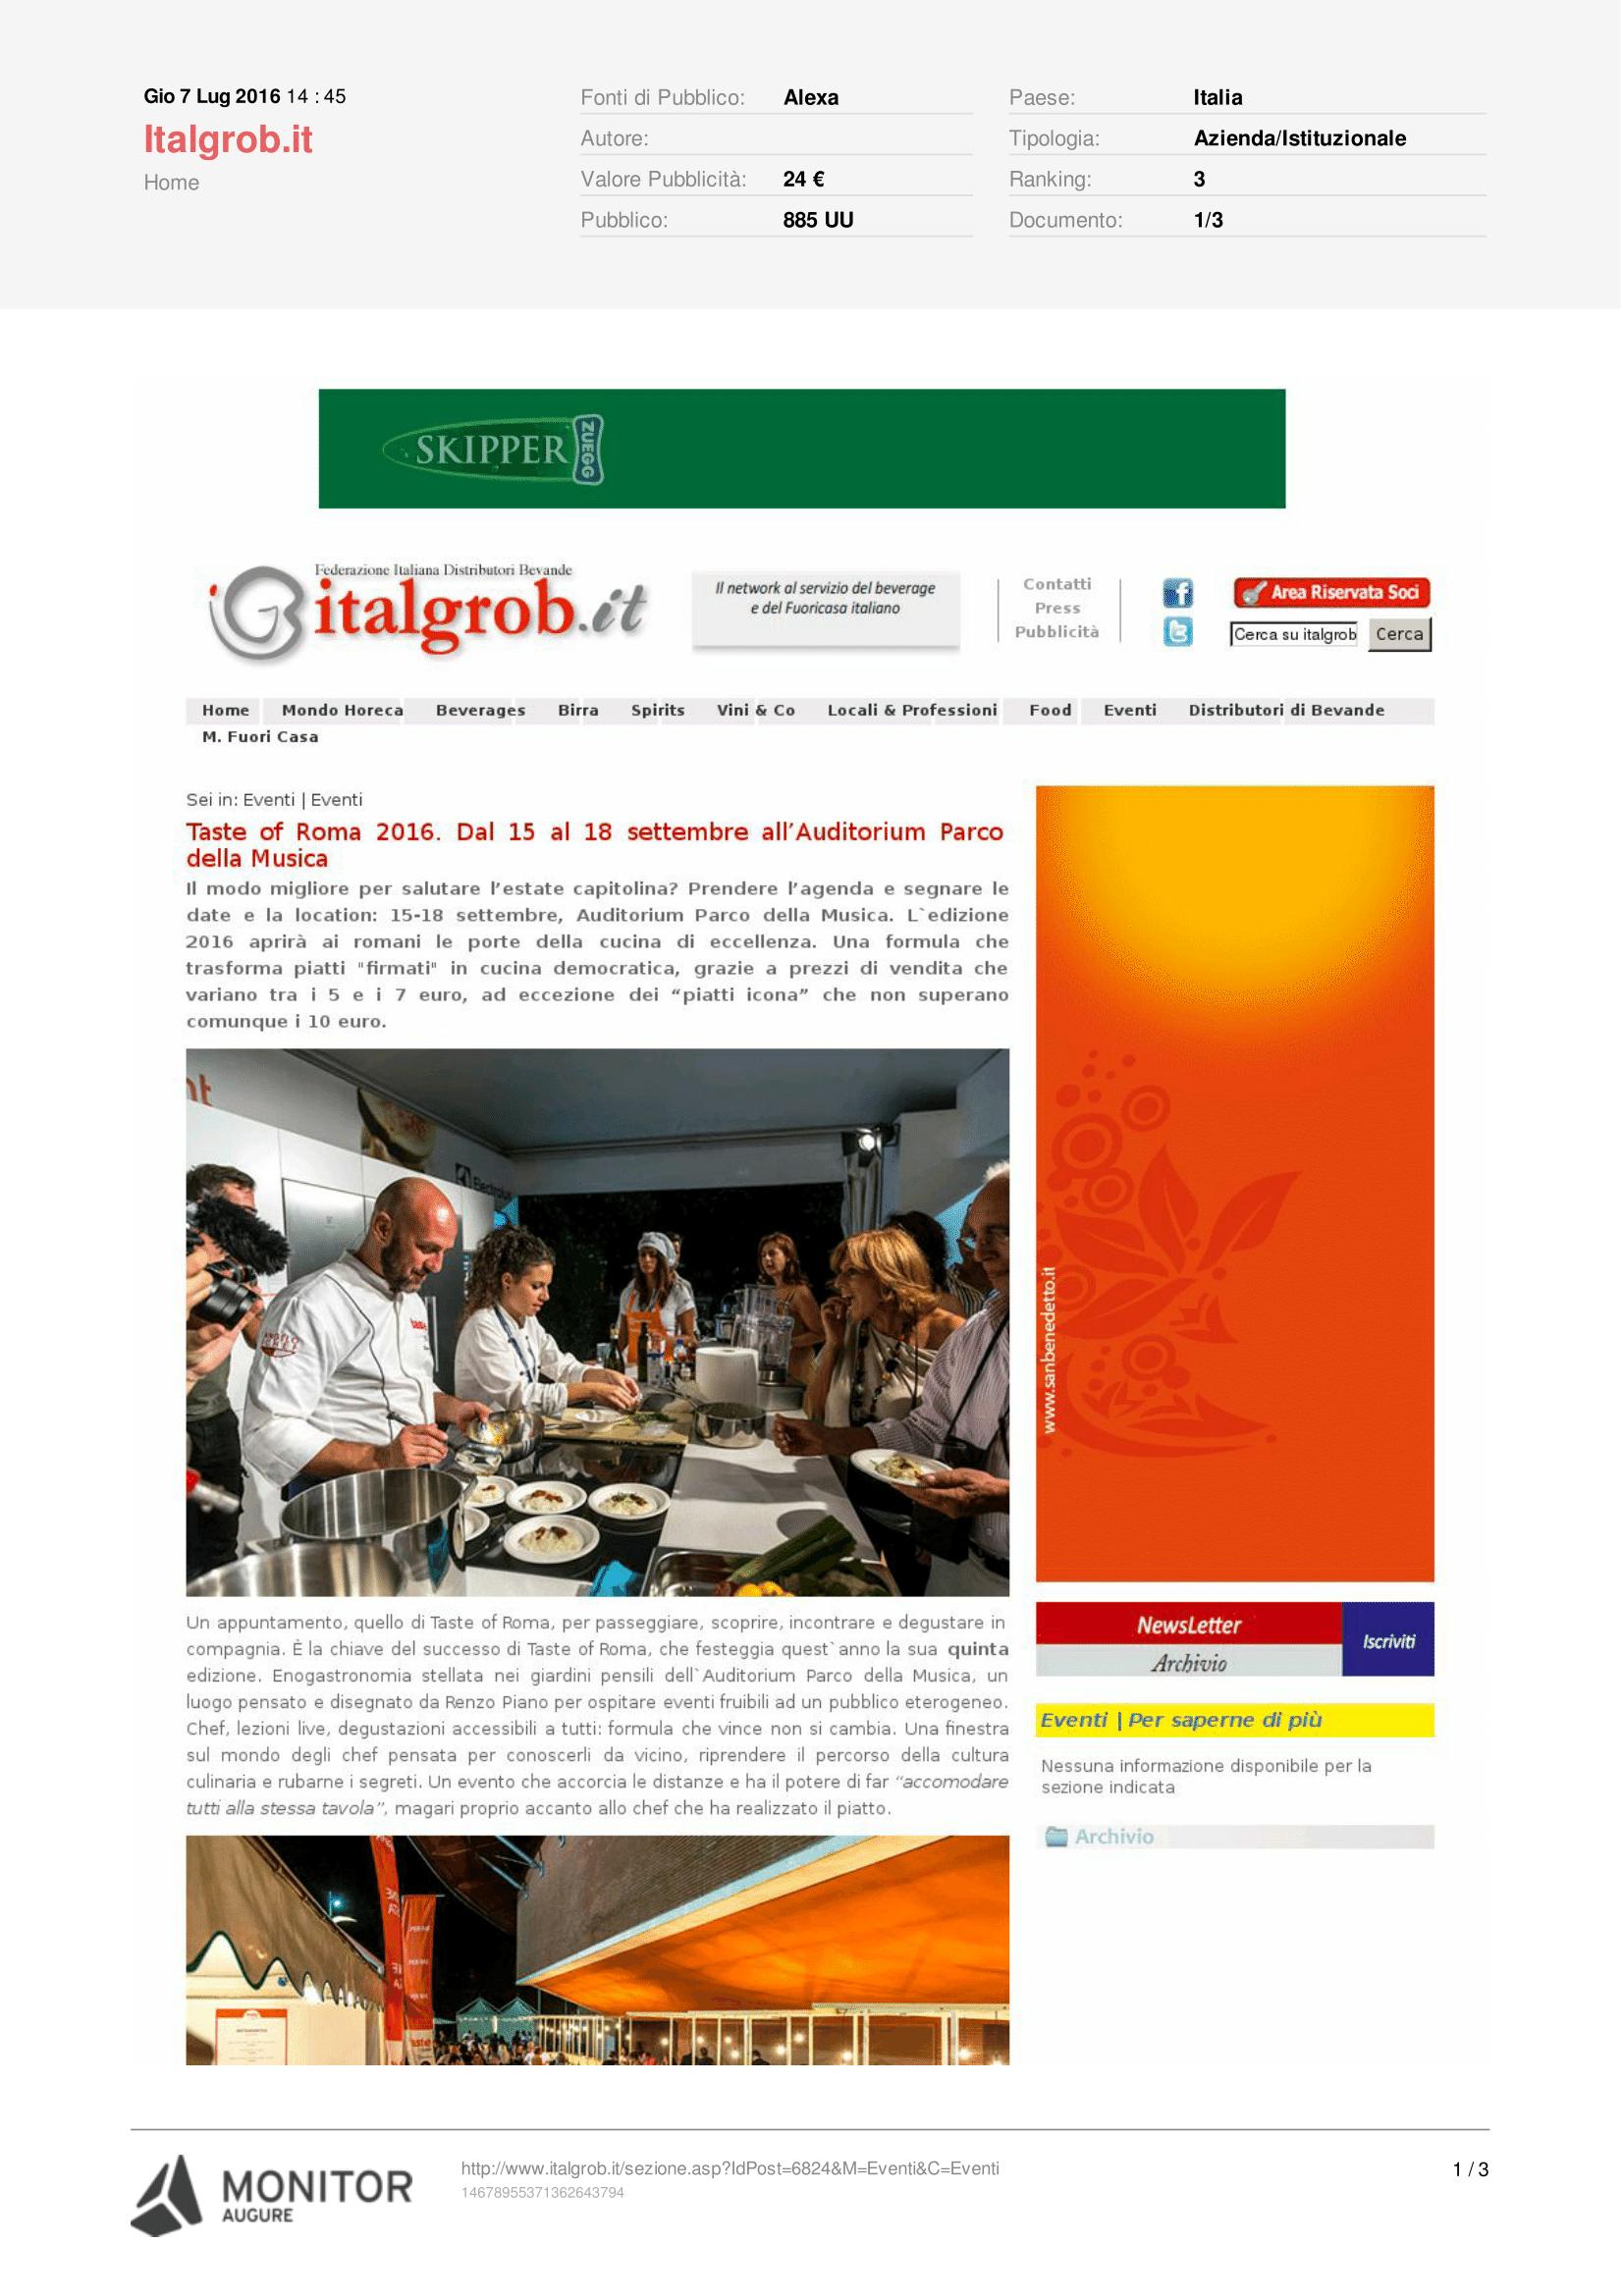 07.07.16_italgrob.it-1